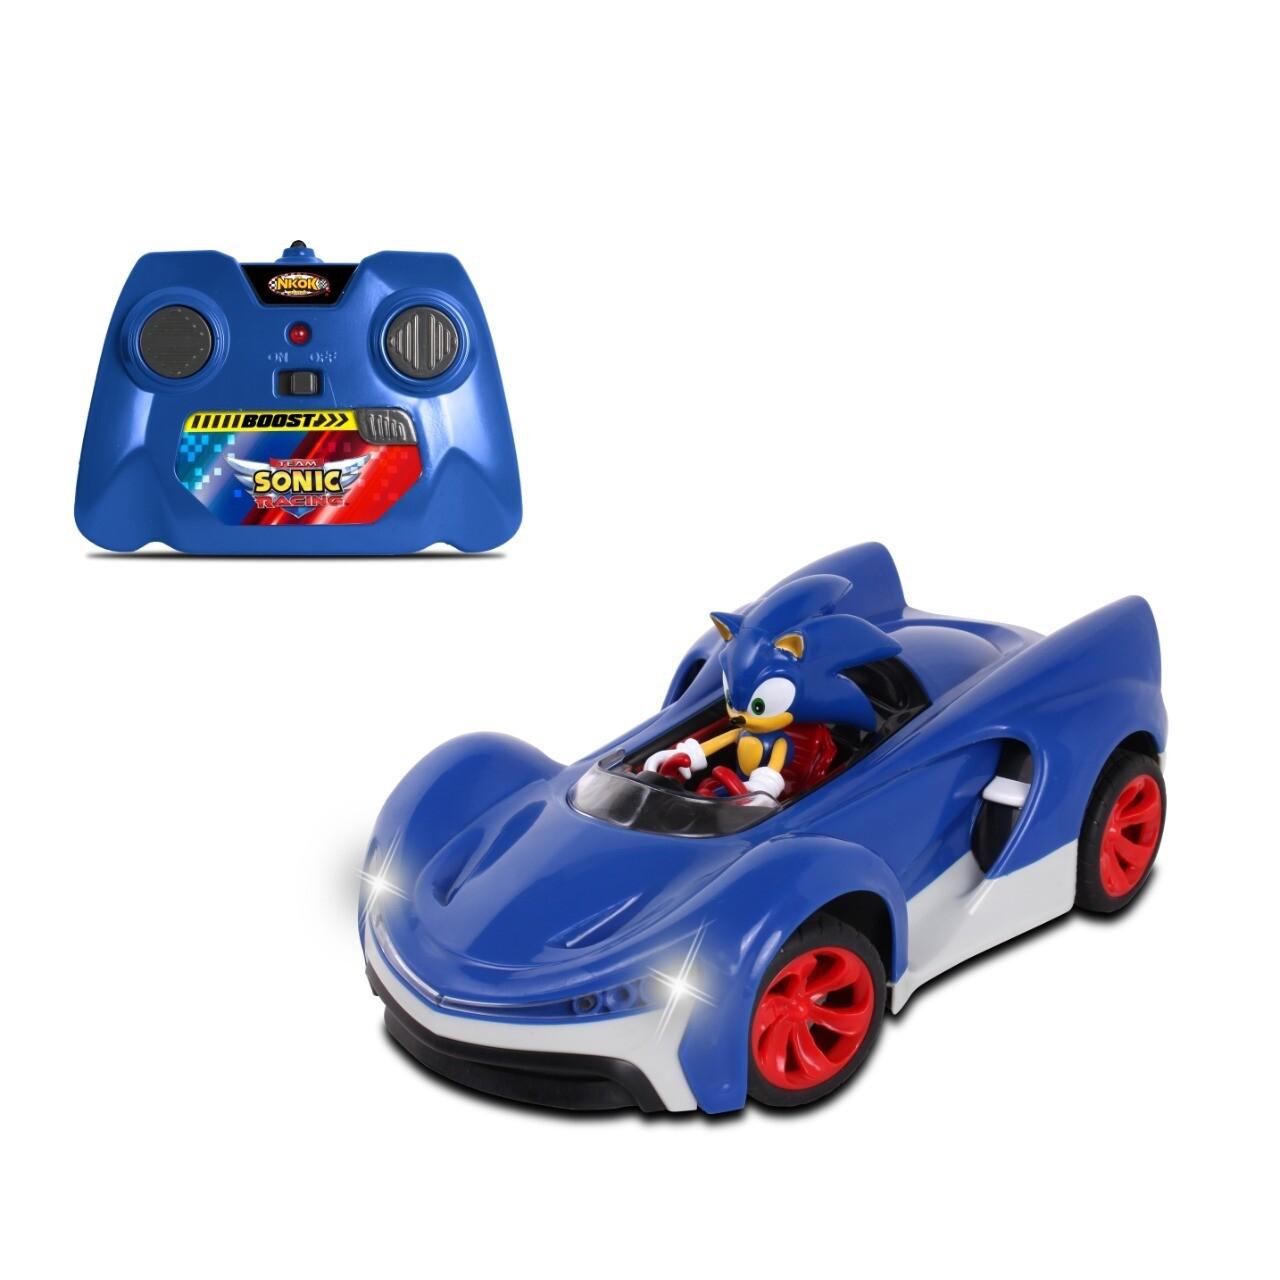 2.4 Ghz R/c Car-Sonic